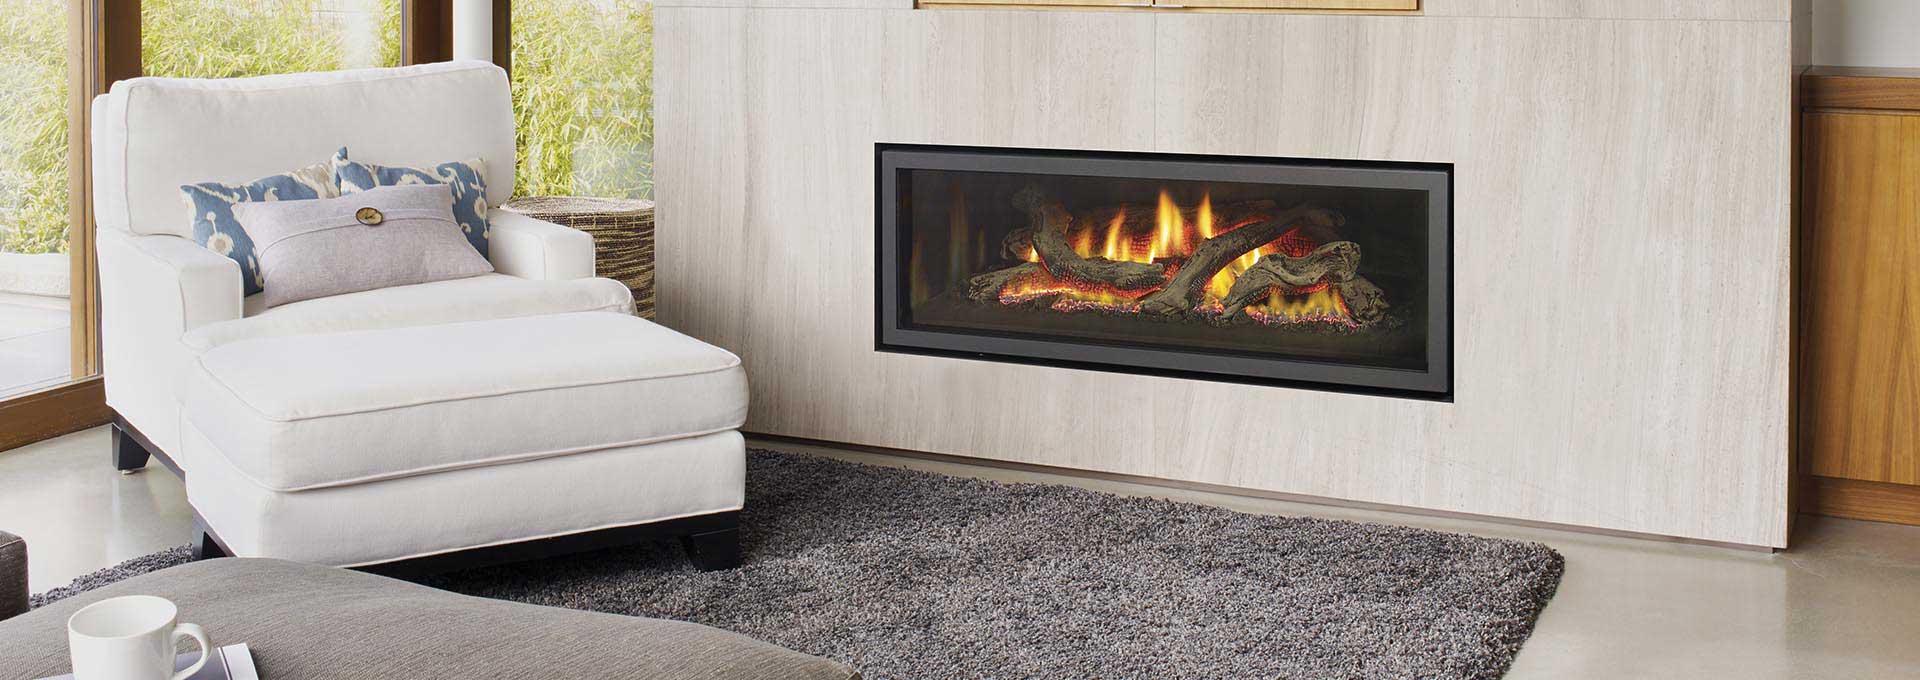 Regency Fireplace Products Australia Gas Wood Fireplaces